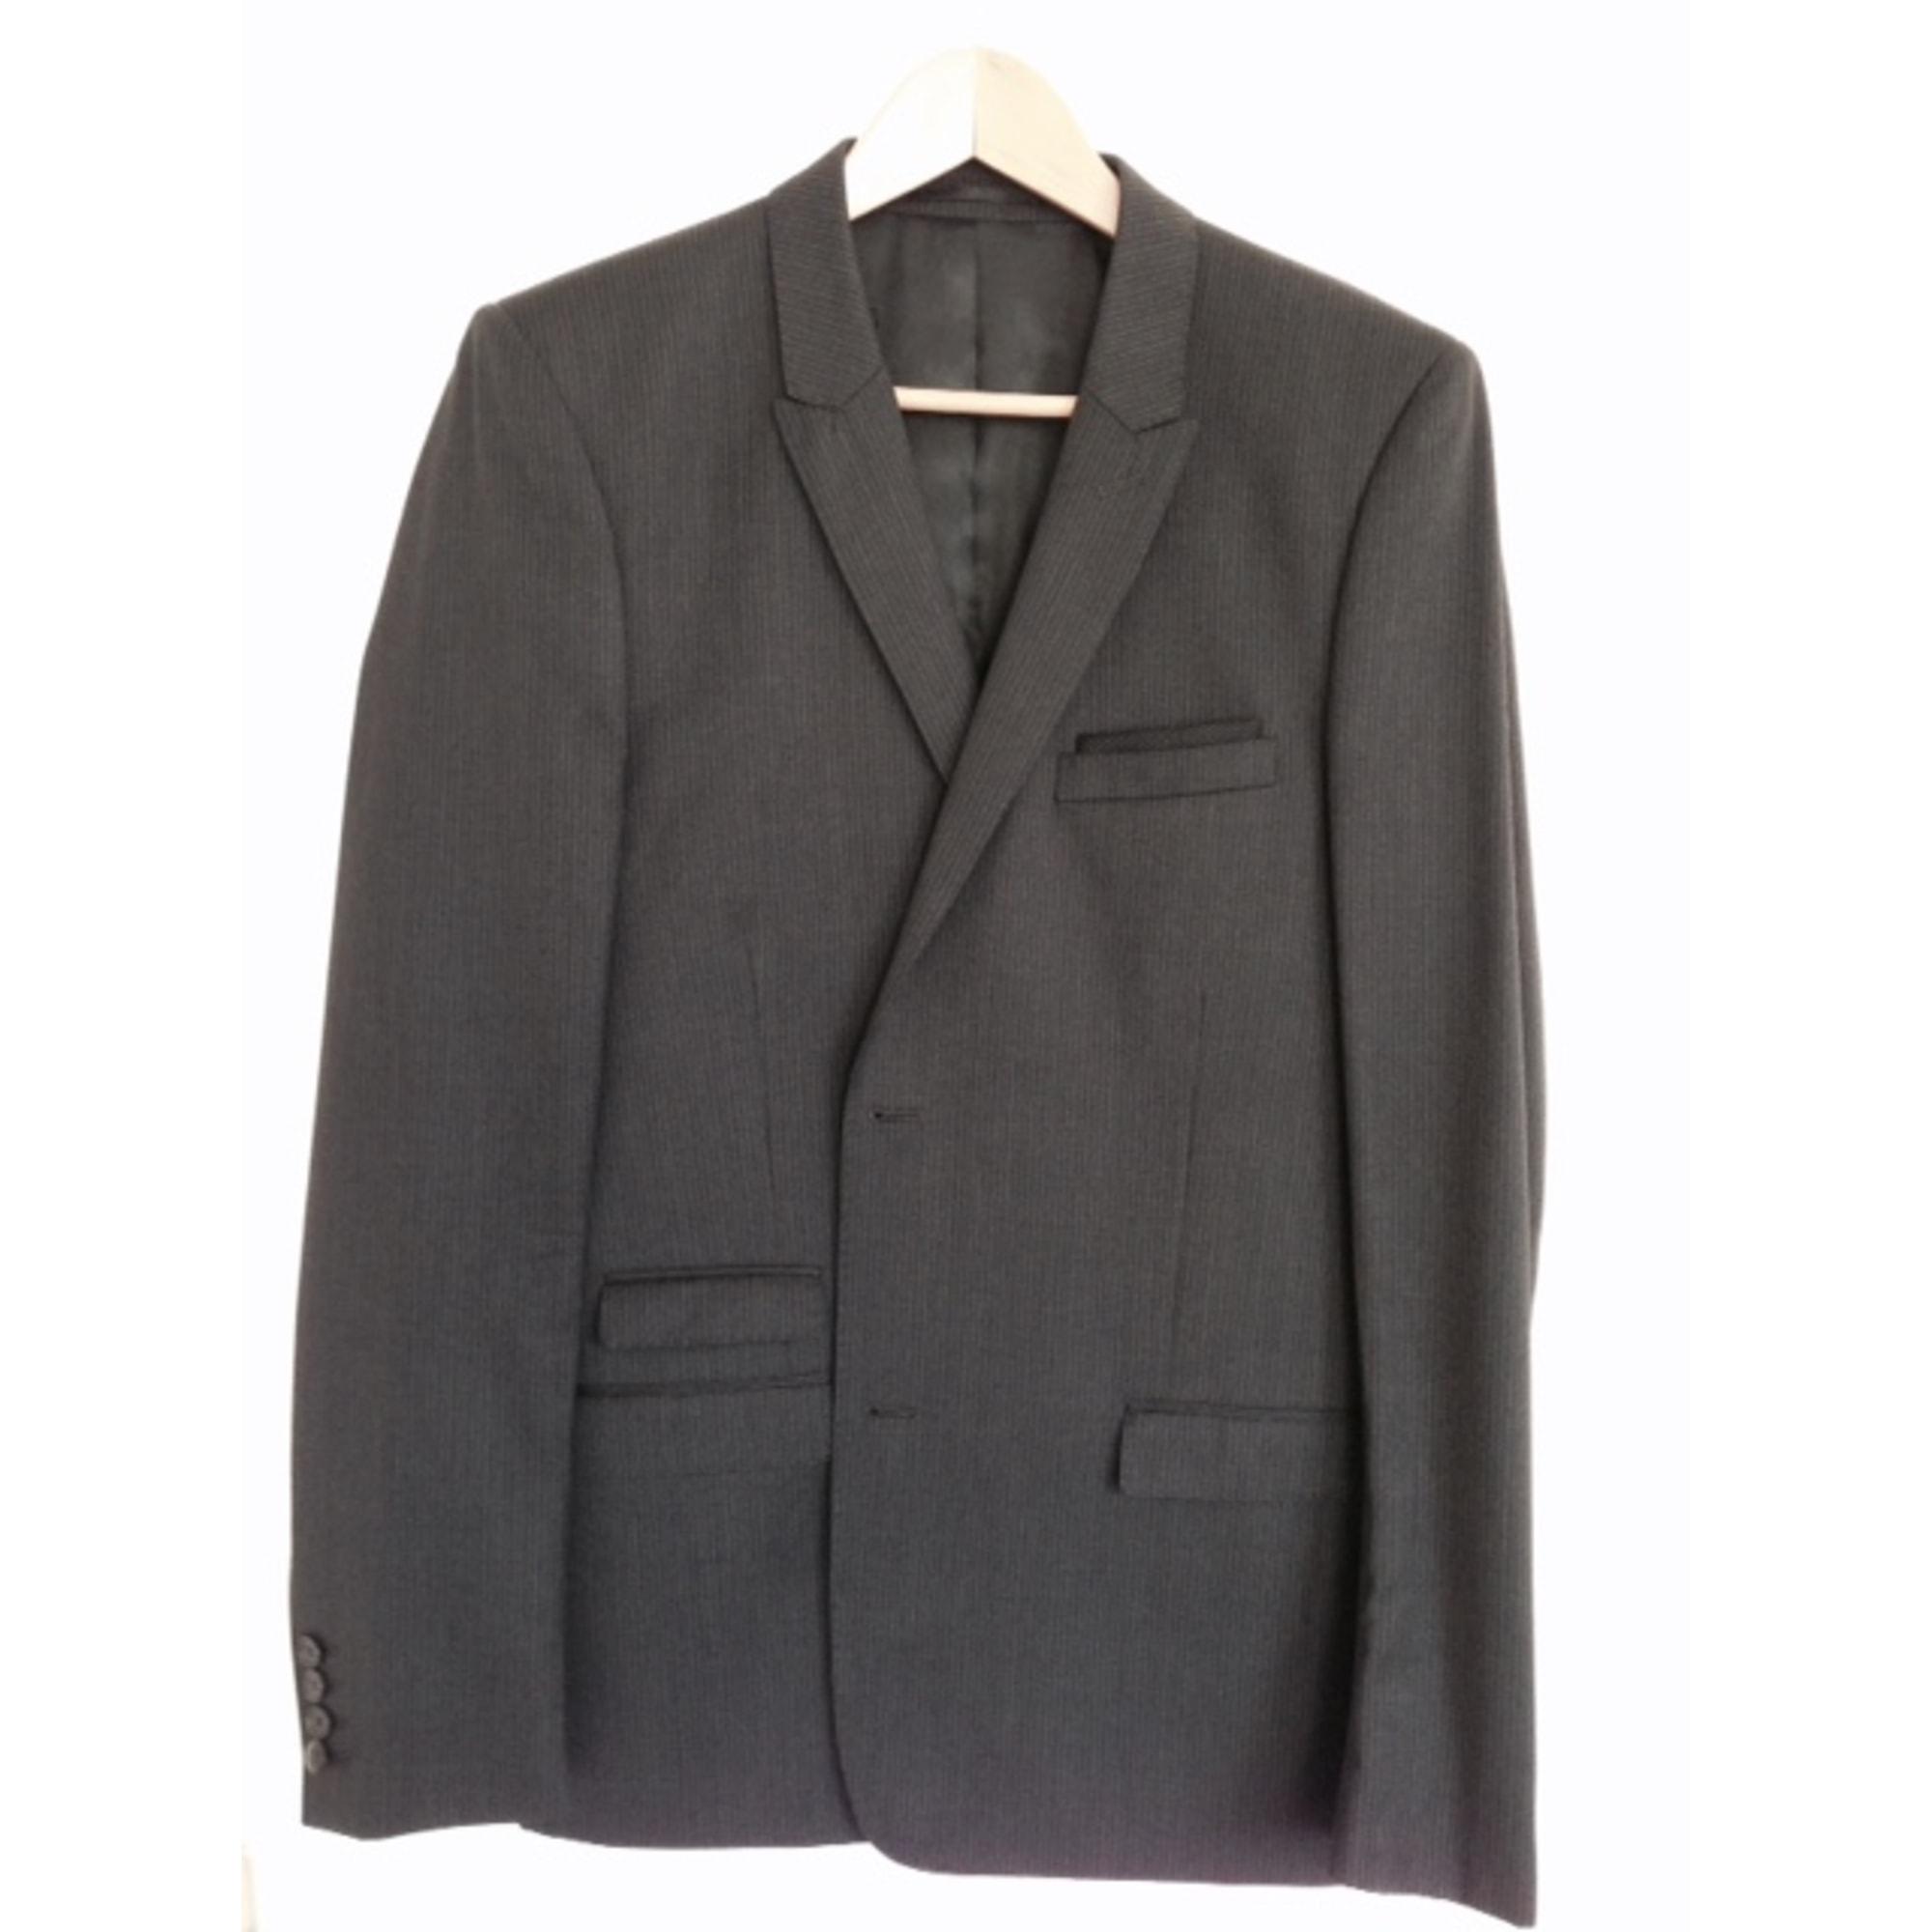 Costume complet THE KOOPLES 52 (L) noir - 3261803 f09d9232d15